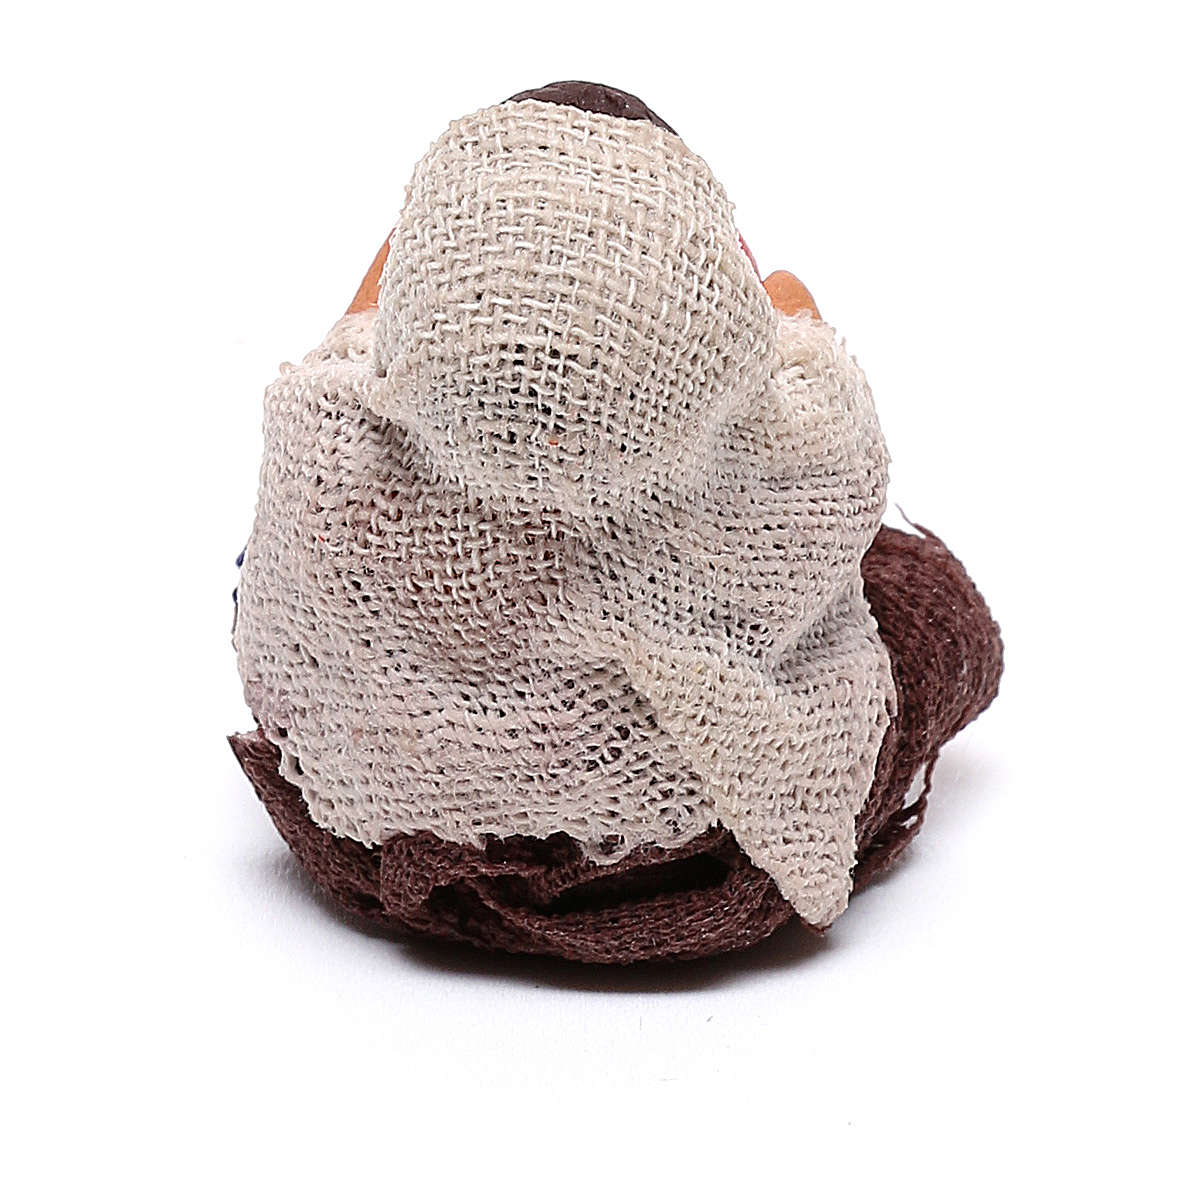 Niño con pelota sentado 10 cm de altura media belén napolitano 4